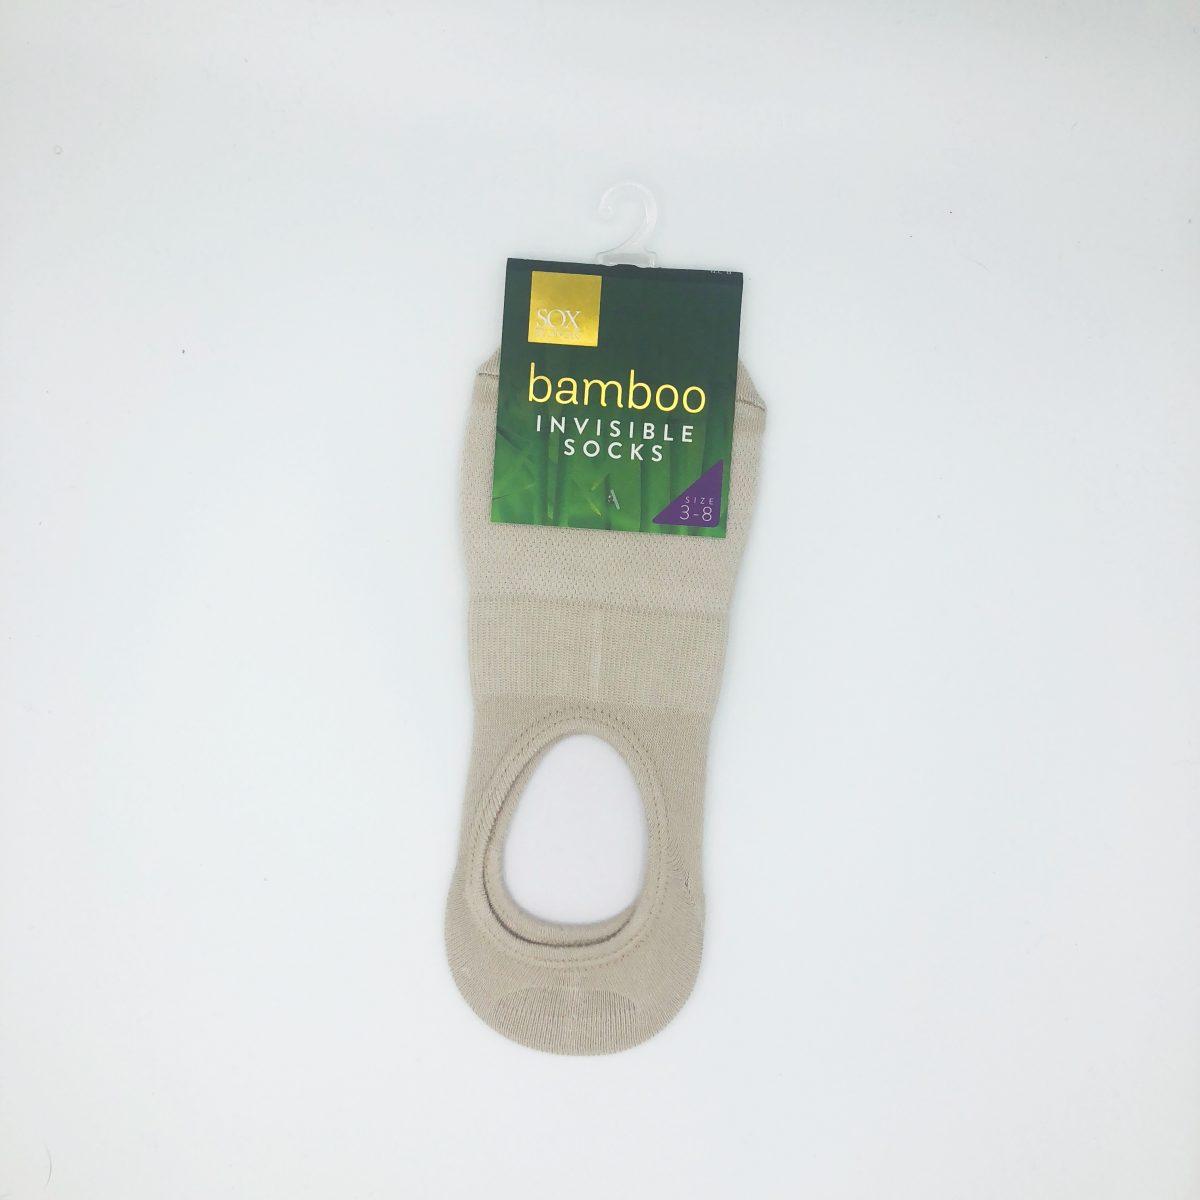 Bamboo invisible socks-hight cut-Fawn